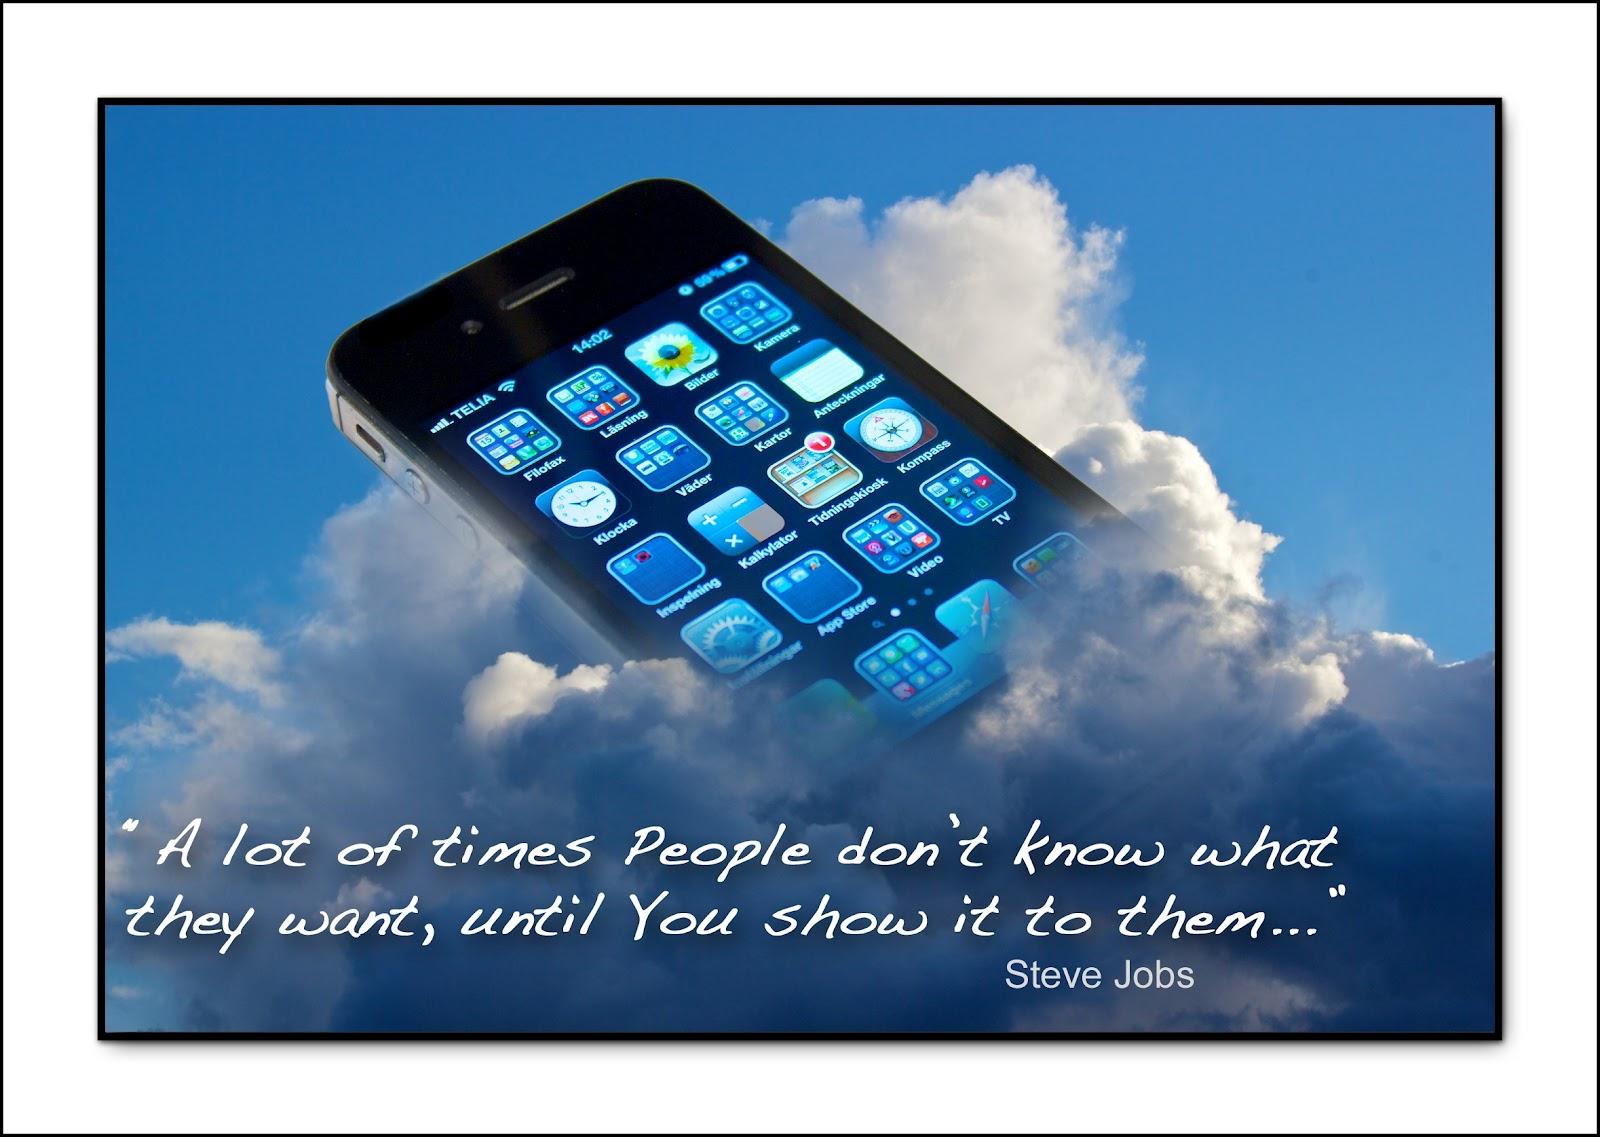 http://1.bp.blogspot.com/-JAOt6r7Iy0A/T76axIm90iI/AAAAAAAAB1U/3SJoKEqS7dA/s1600/Steve+Jobs+Quote.jpg